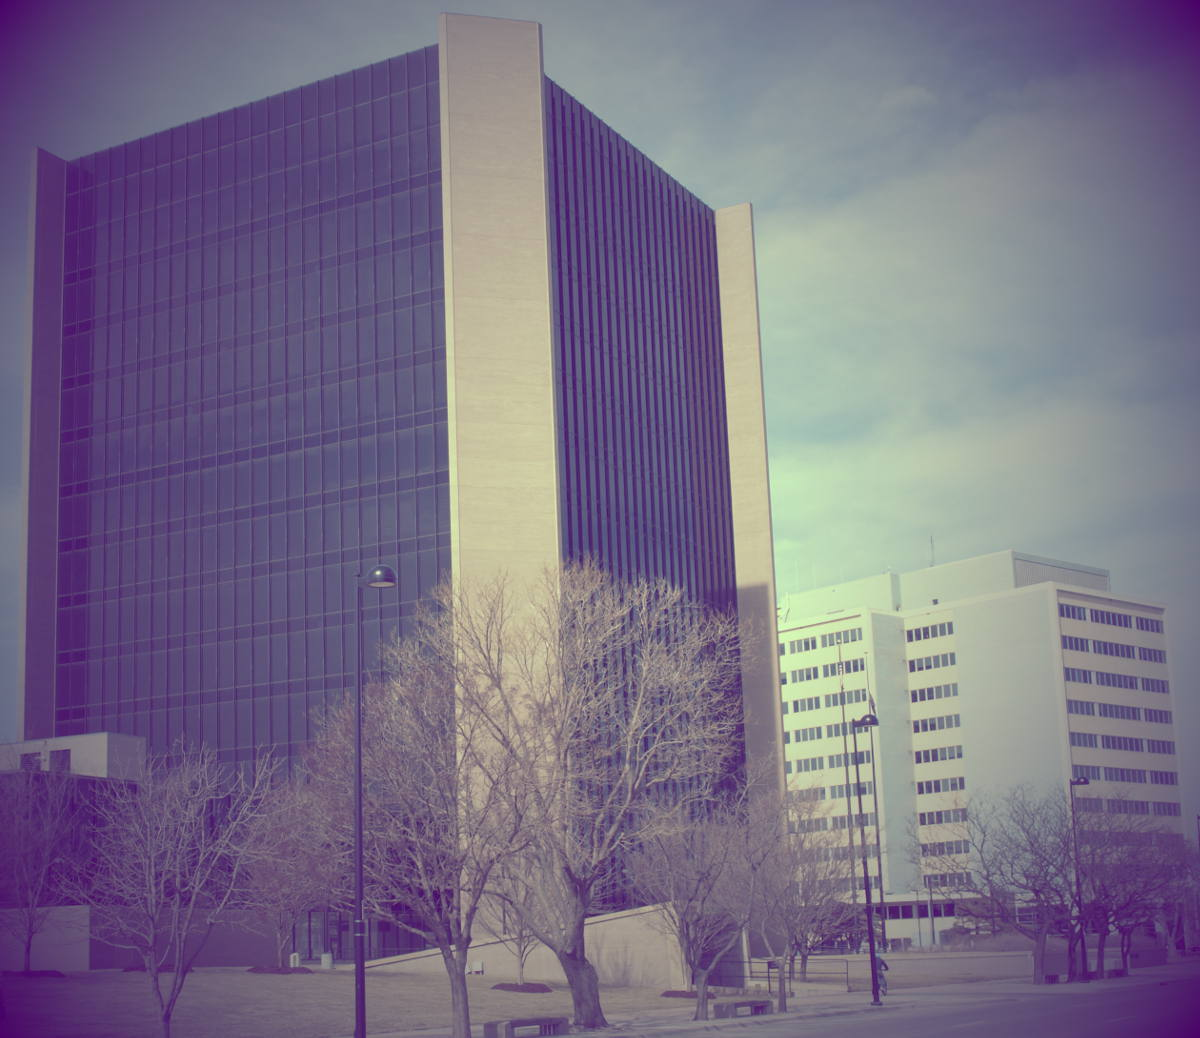 City of Wichita State Legislative Agenda: Economic Development